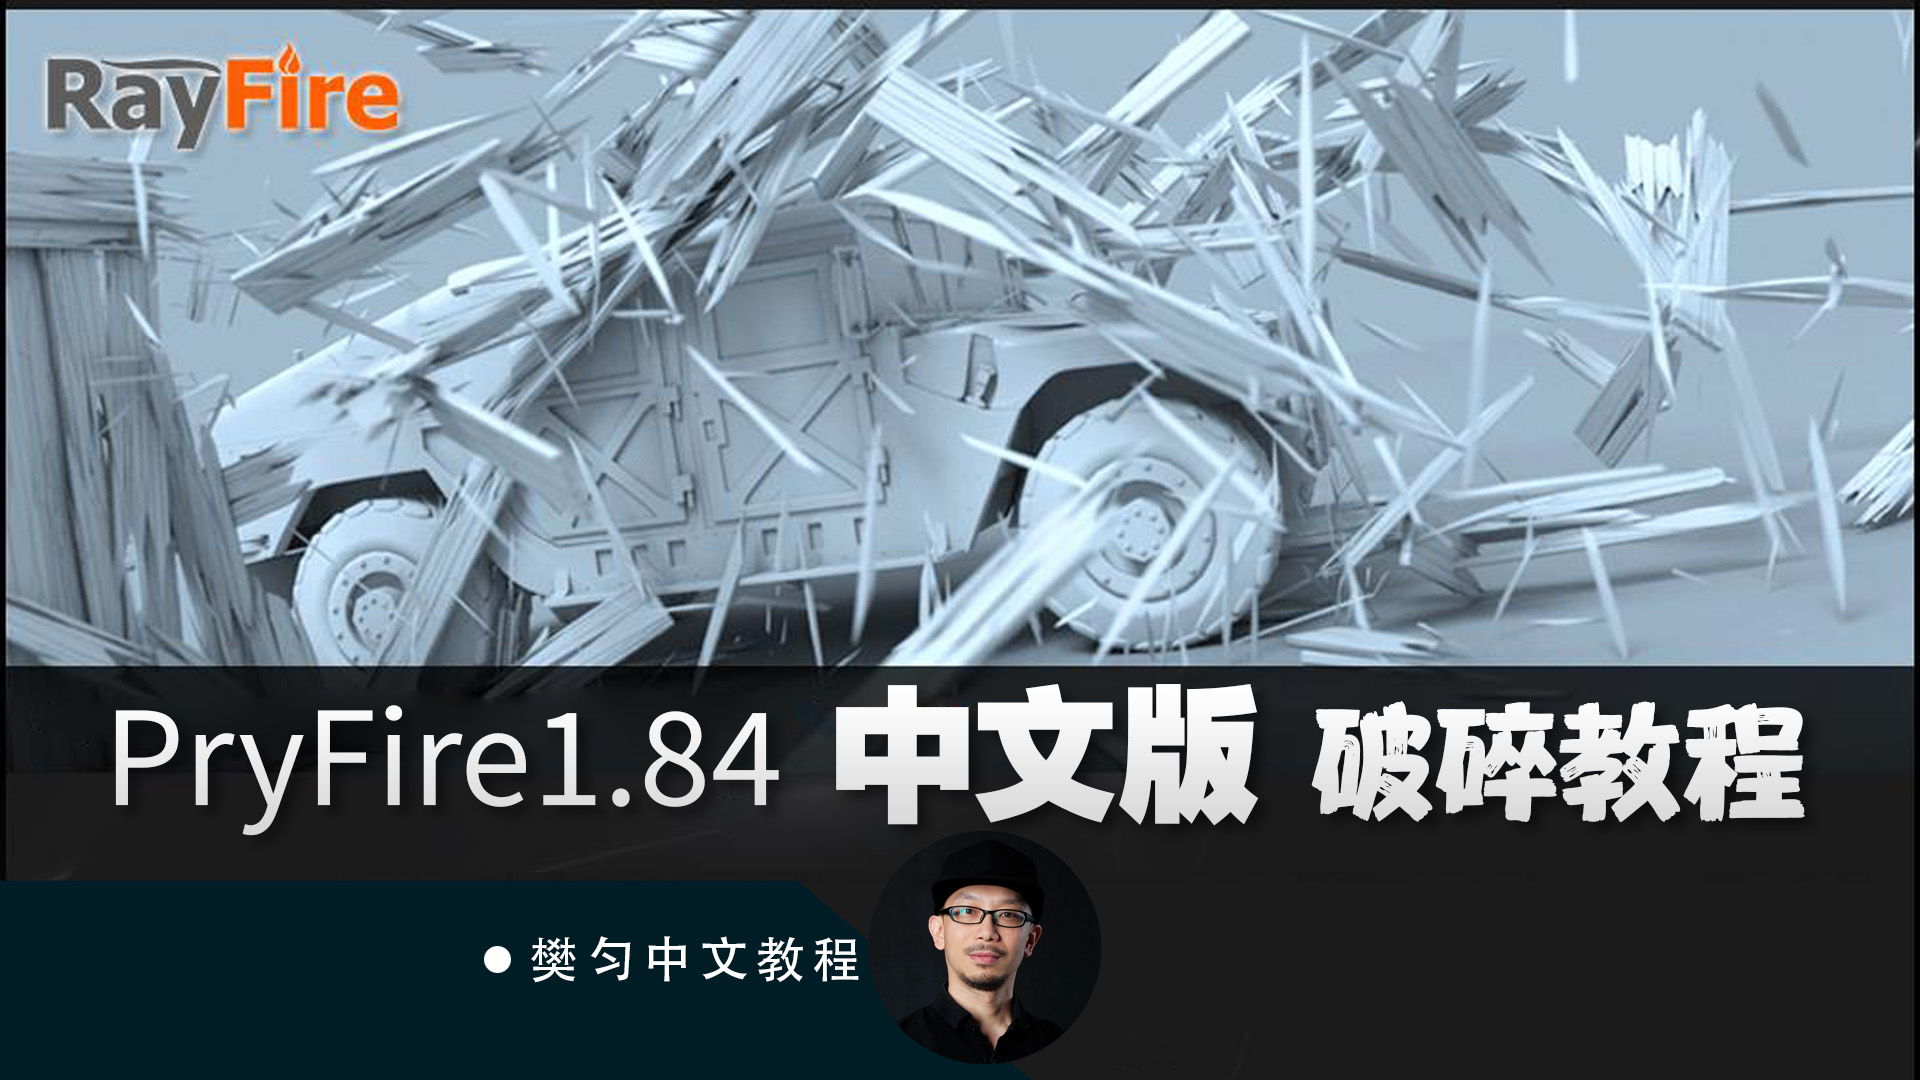 RayFire1.84中文版-MAX破碎教程